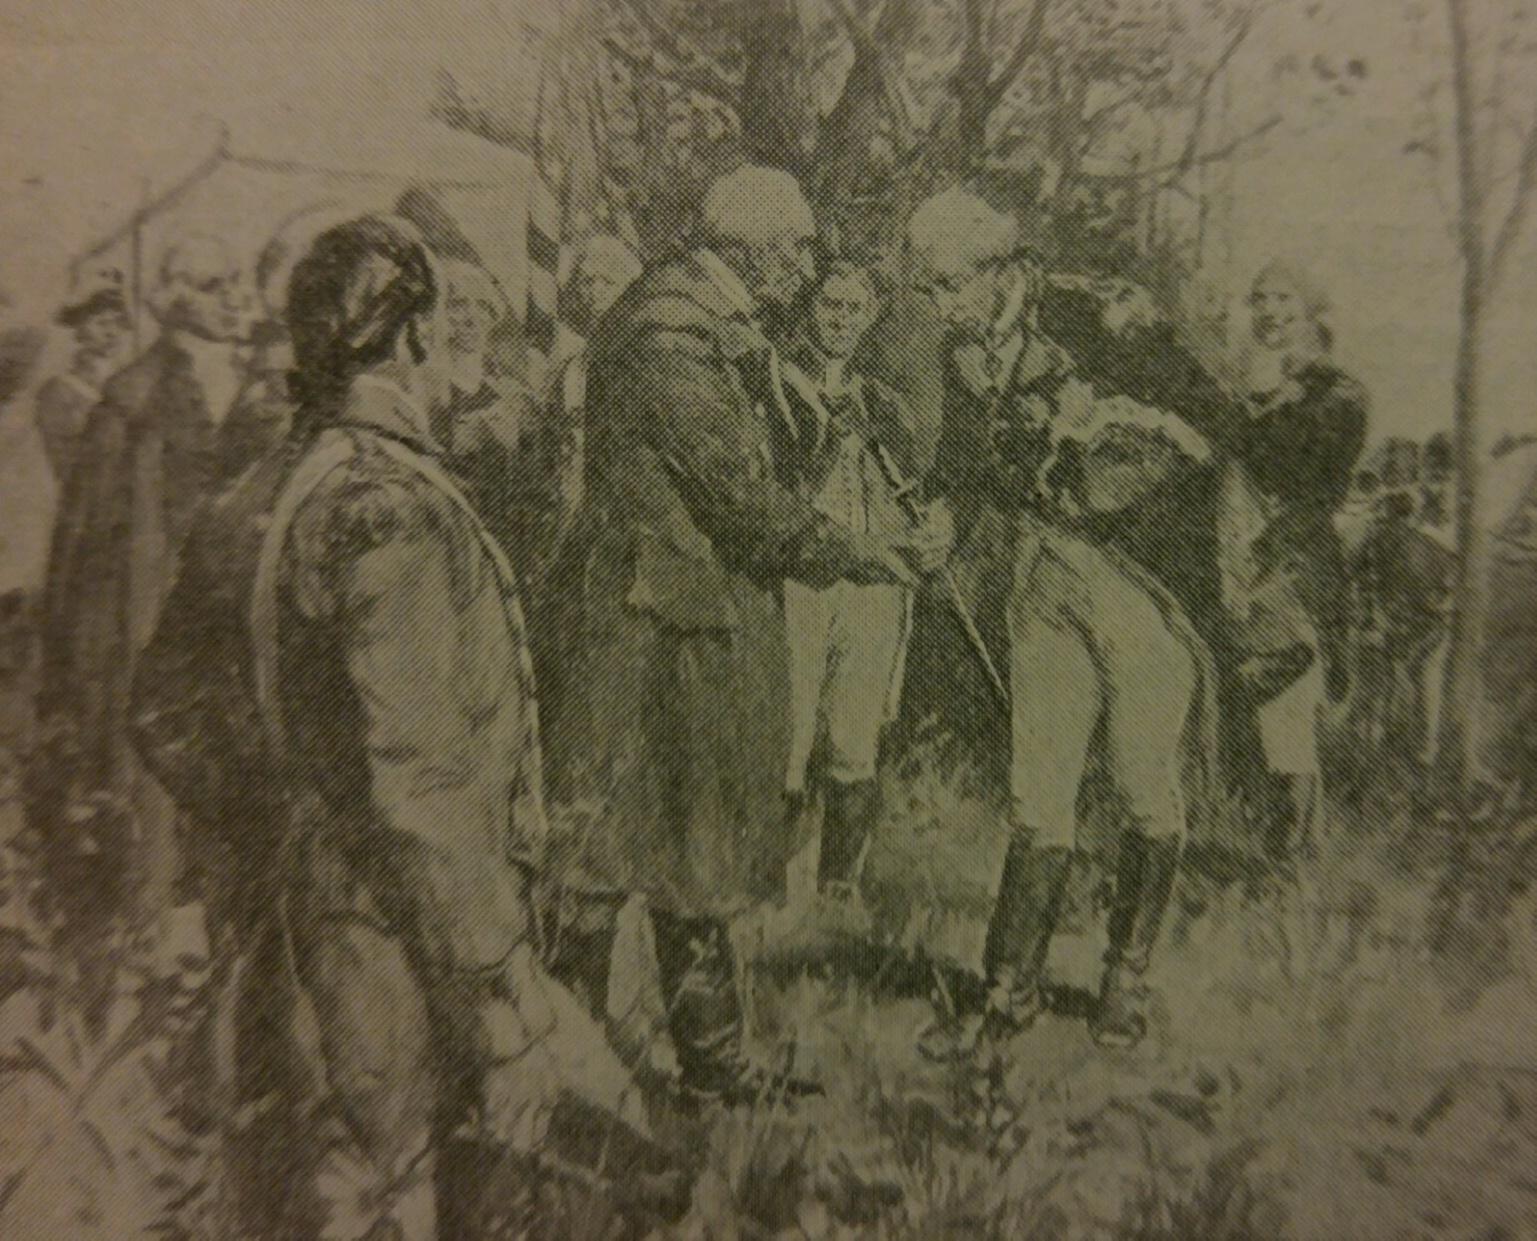 Surrender at Saratoga